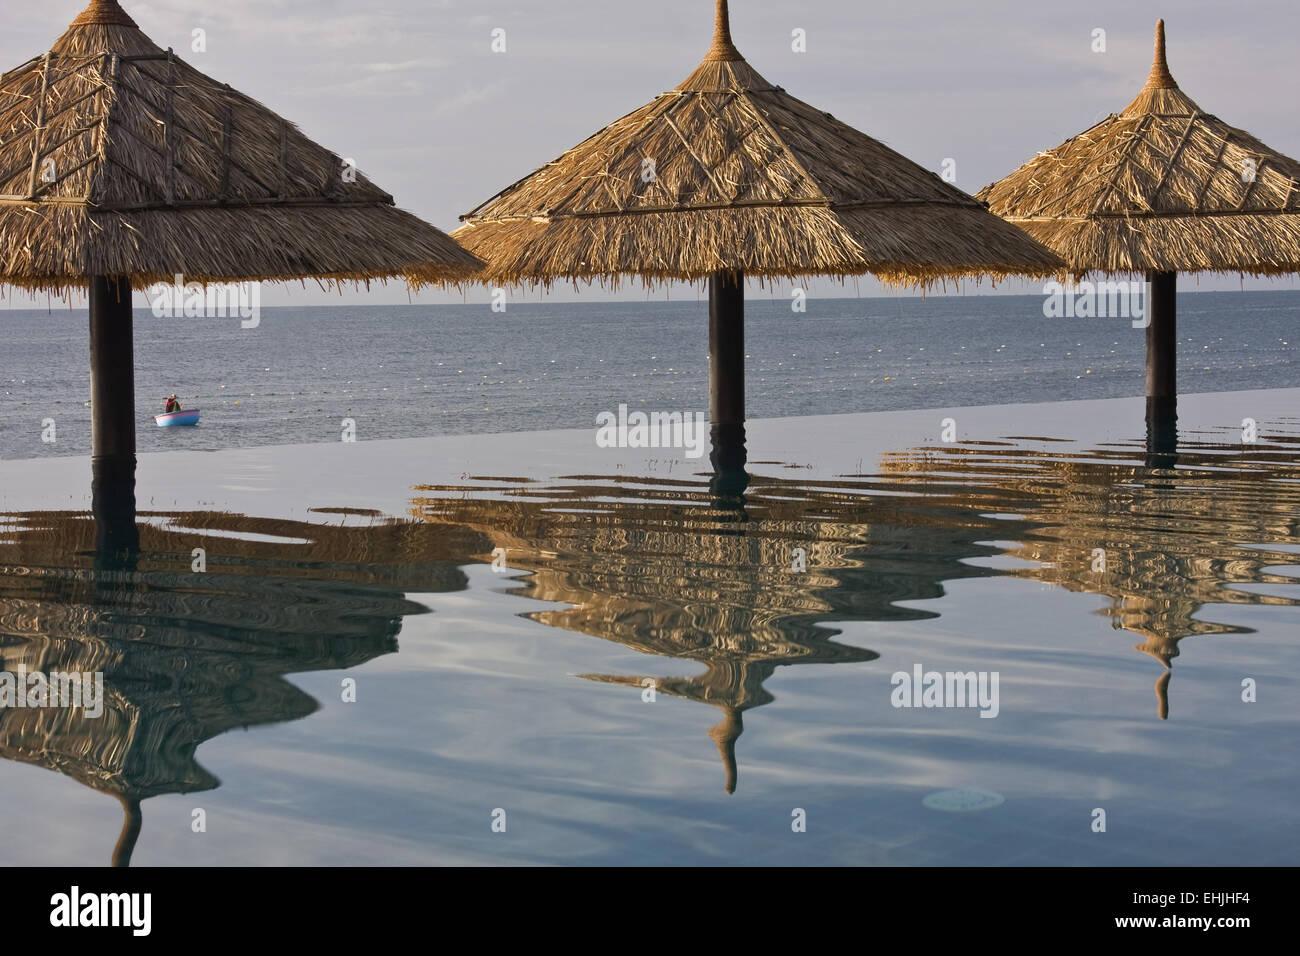 LotusVillage Resort,Mui NeVietam,asia Stock Photo